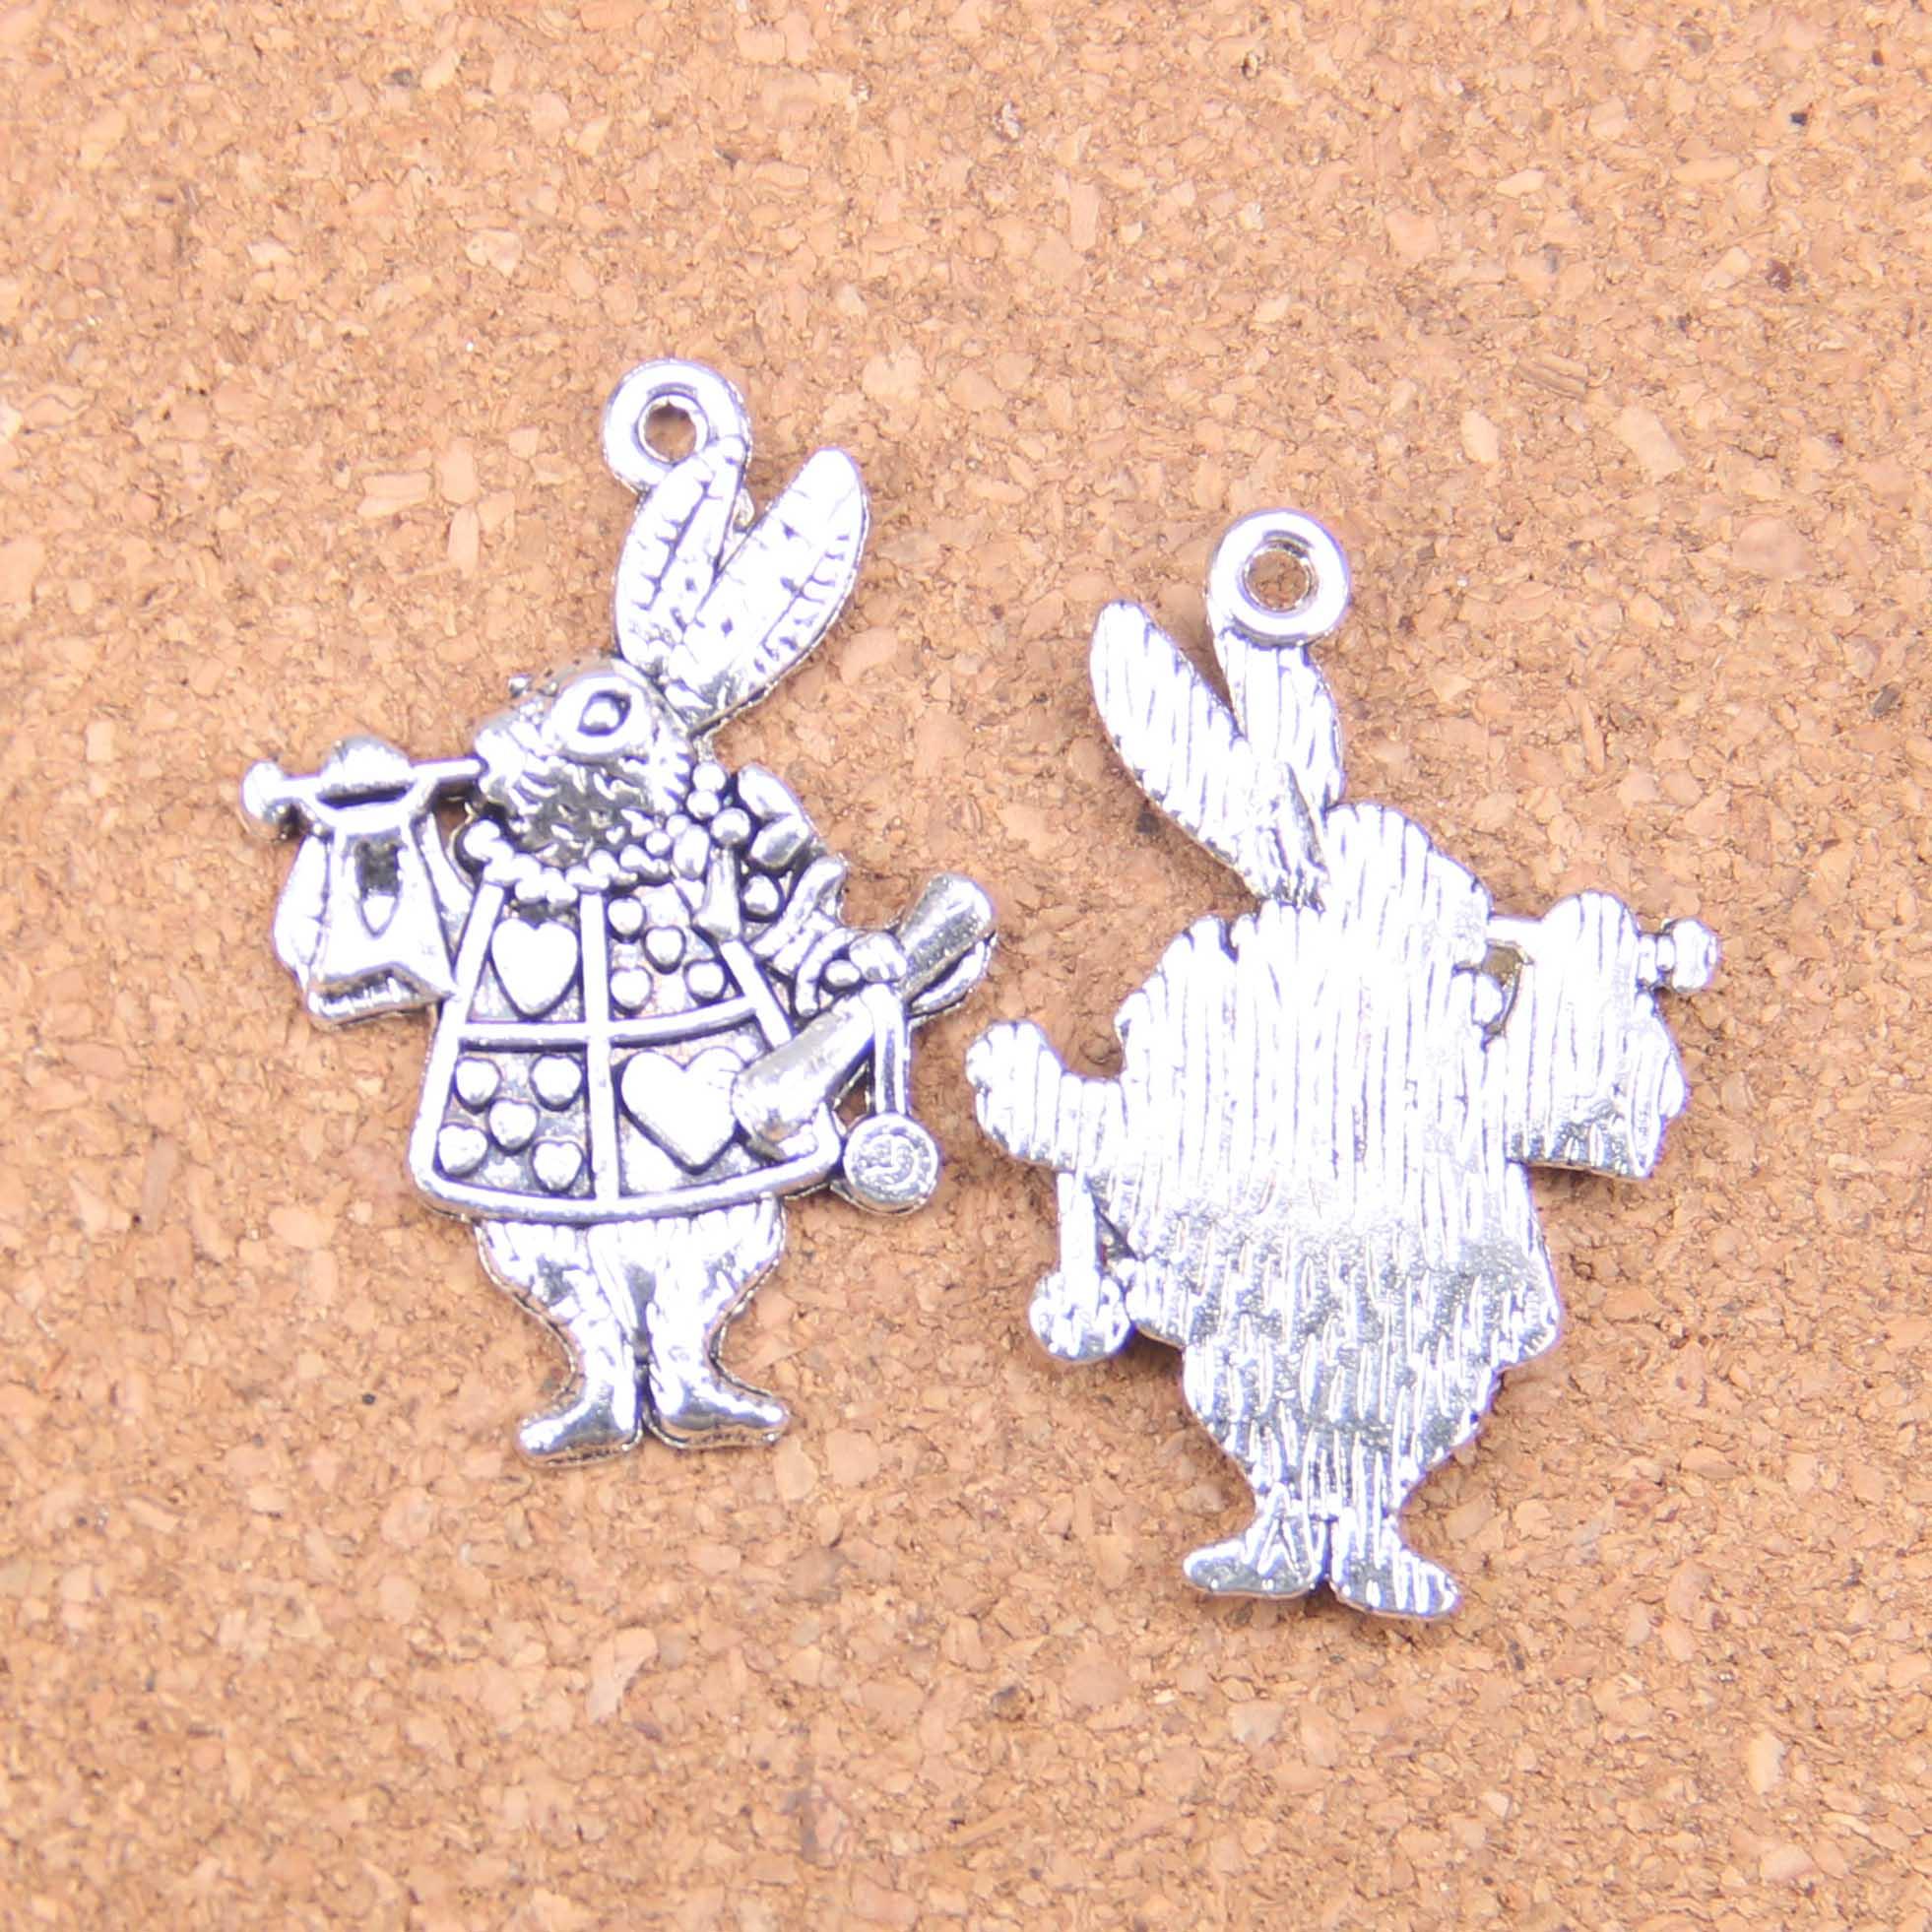 26pcs Charms Musical Rabbit Trumpet 36x23mm Antique Pendants,vintage Tibetan Silver Jewelry,diy For Bracelet Necklace Numerous In Variety